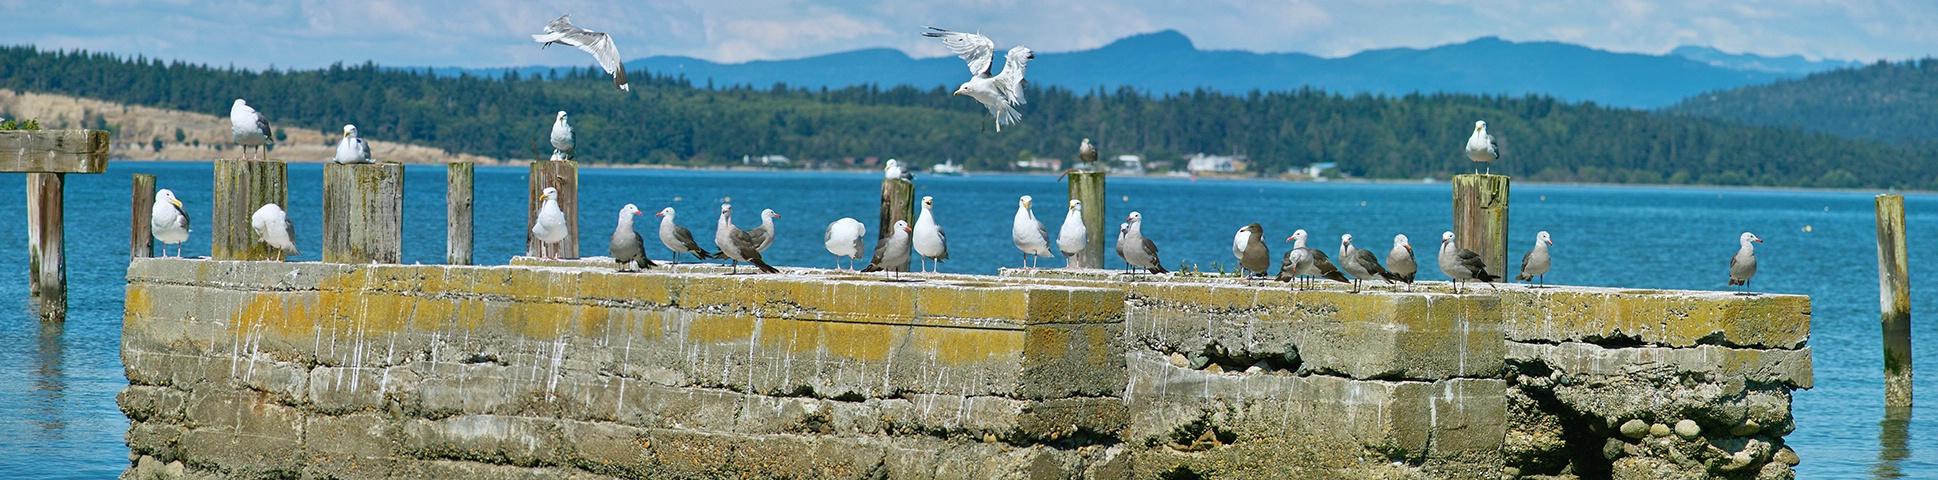 <b>Anacortes Seagulls</b>